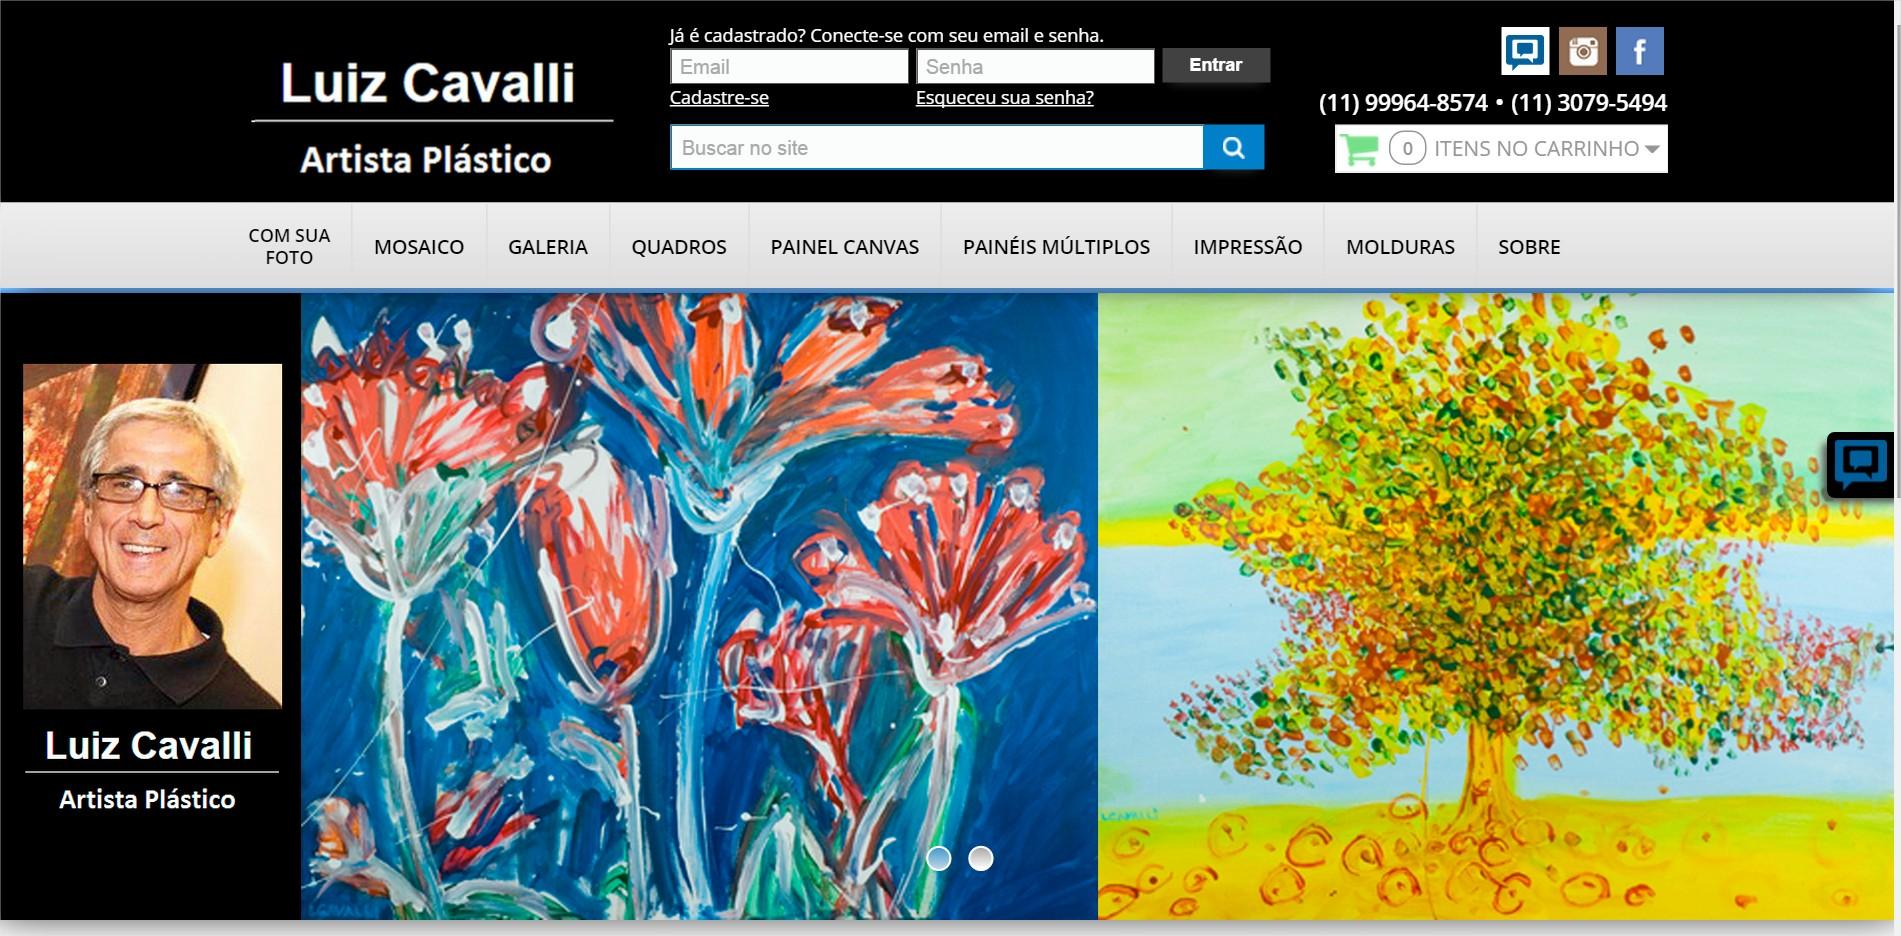 Luiz cavalli Online Quadros - Impressão Fine Art